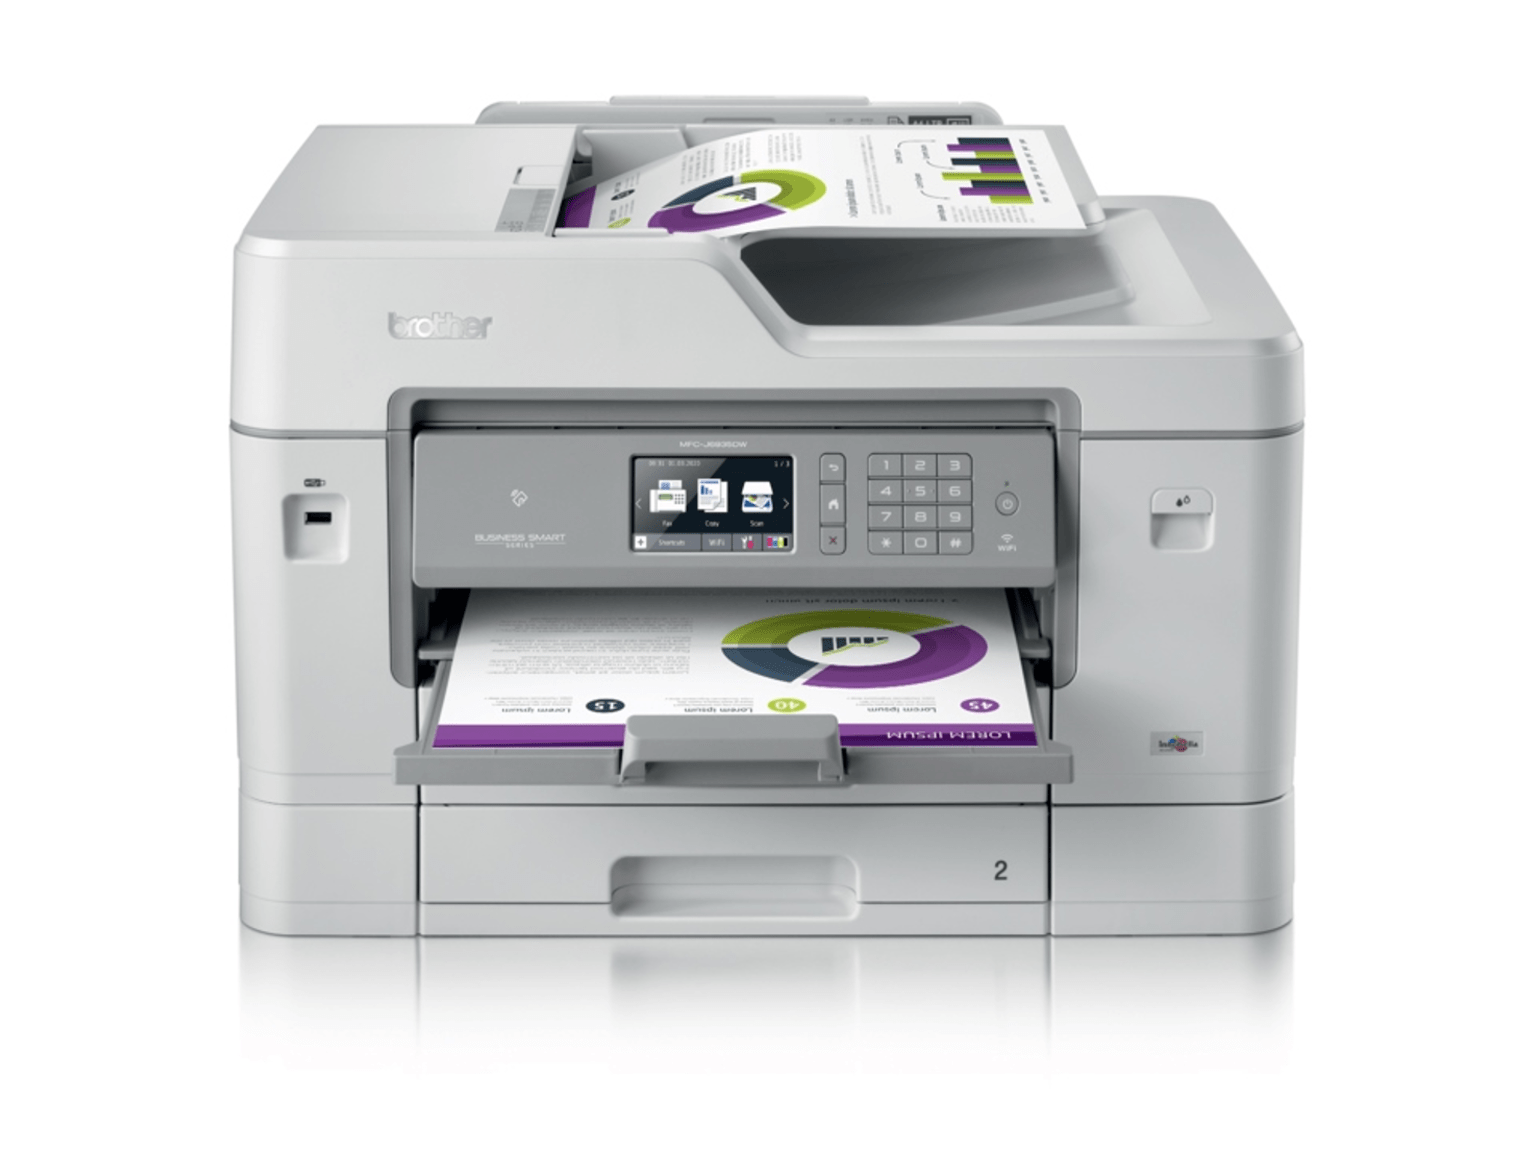 Impressora multifunções de tinta A4/A3 MFC-J6935DW